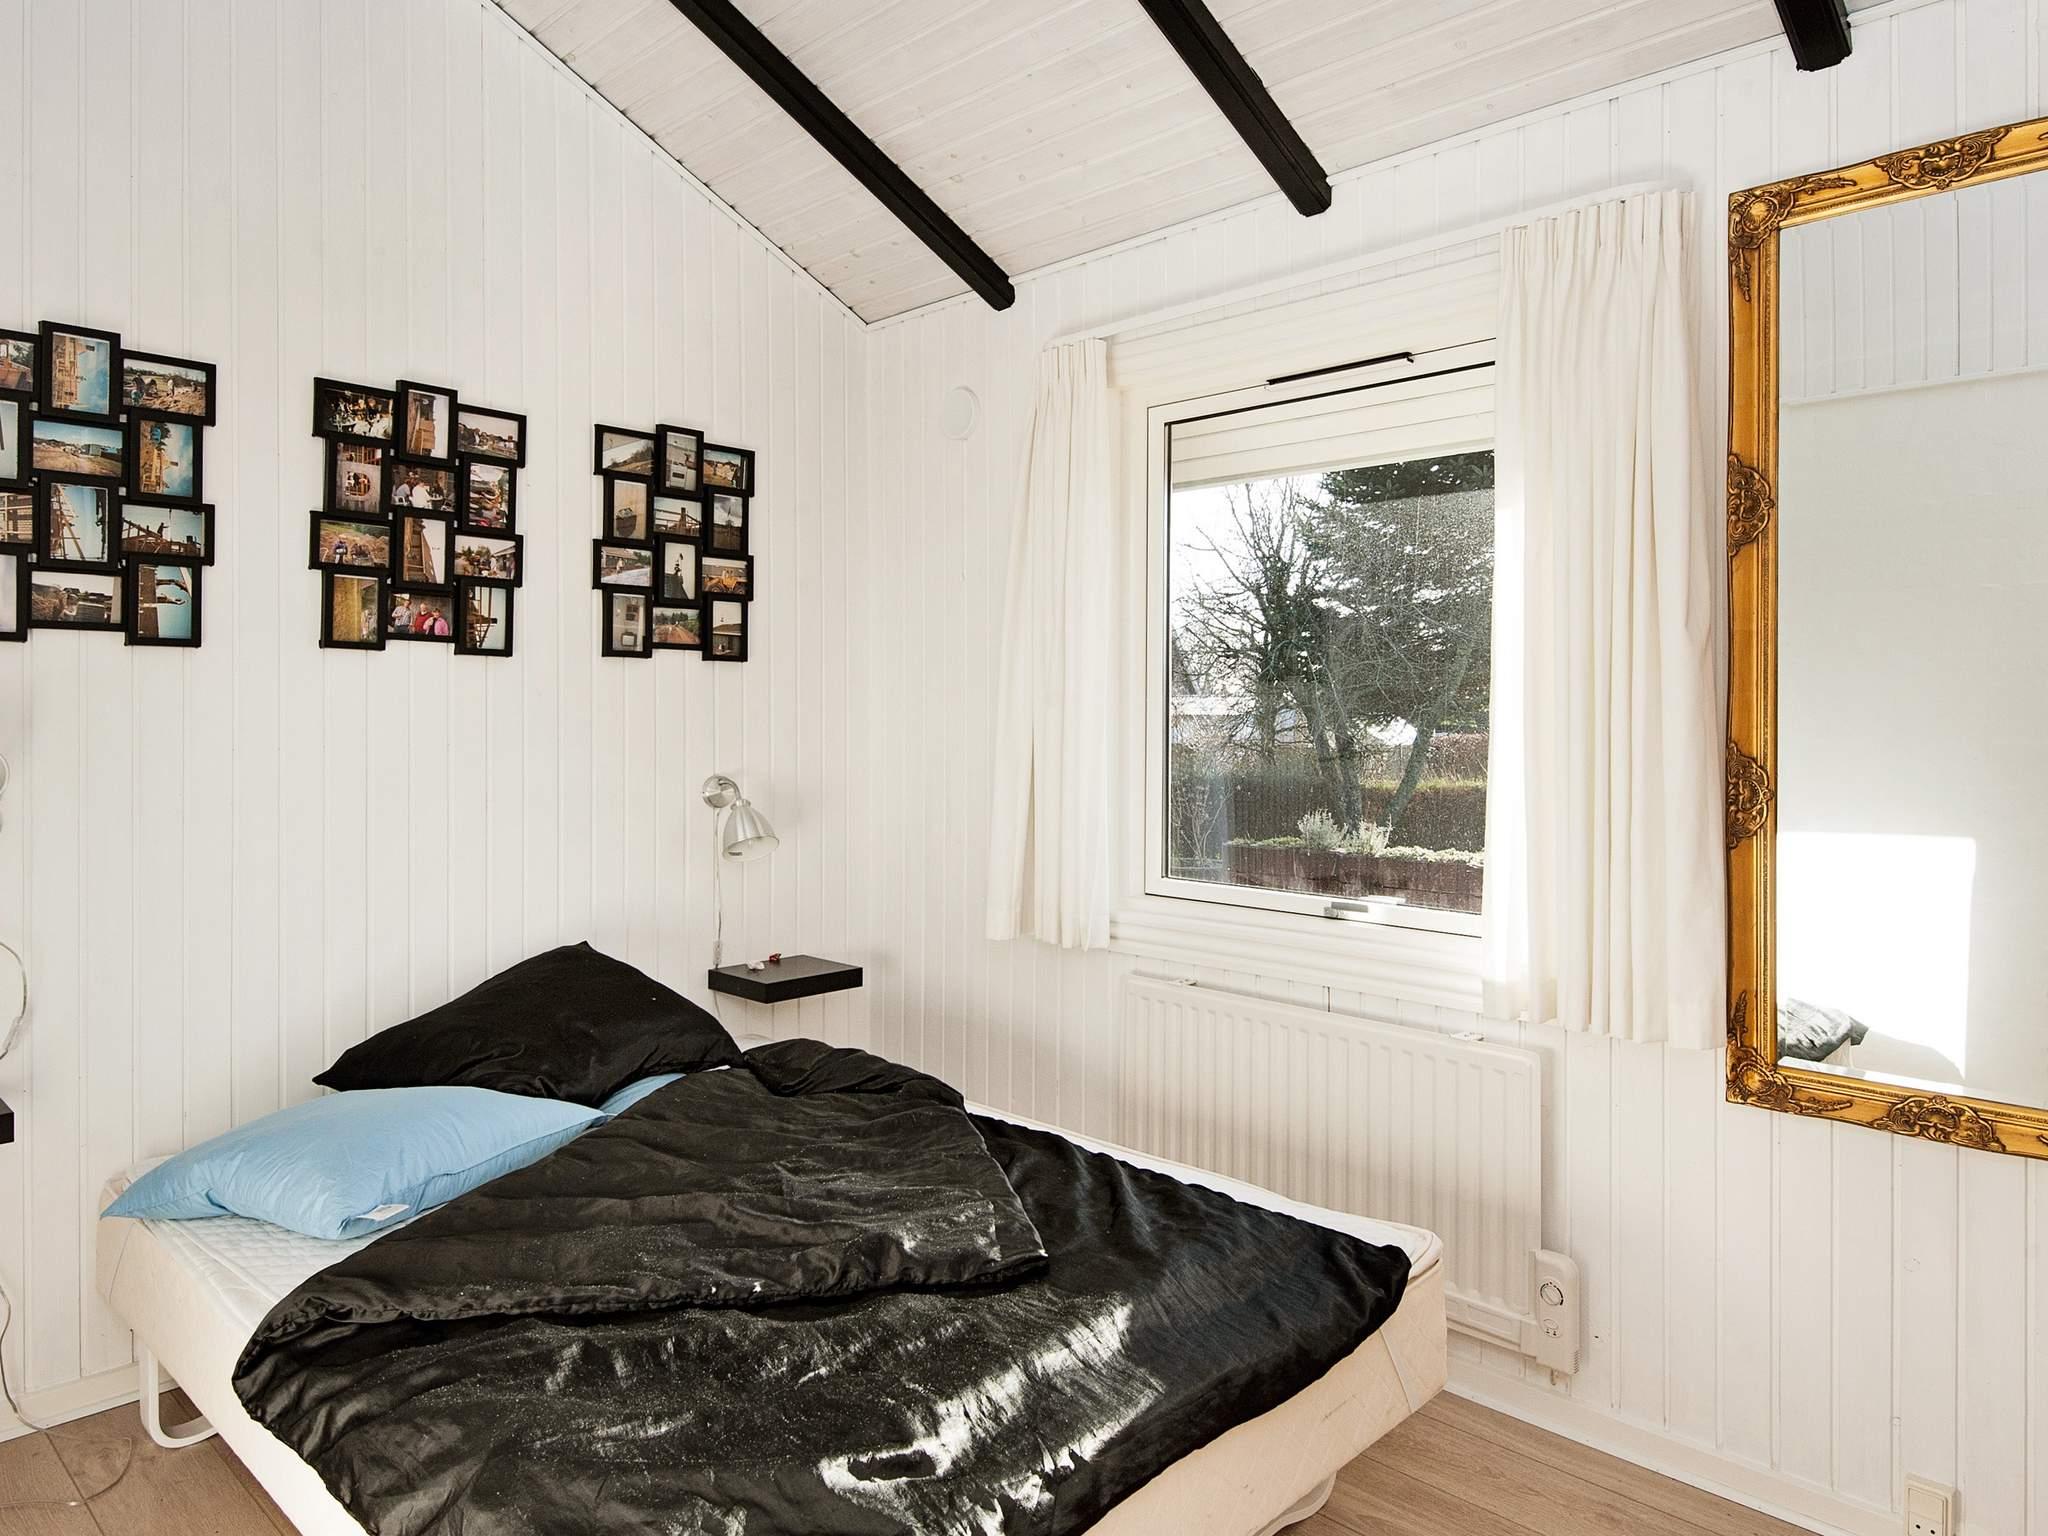 Ferienhaus Hejlsminde Strand (85685), Hejls, , Südostjütland, Dänemark, Bild 17